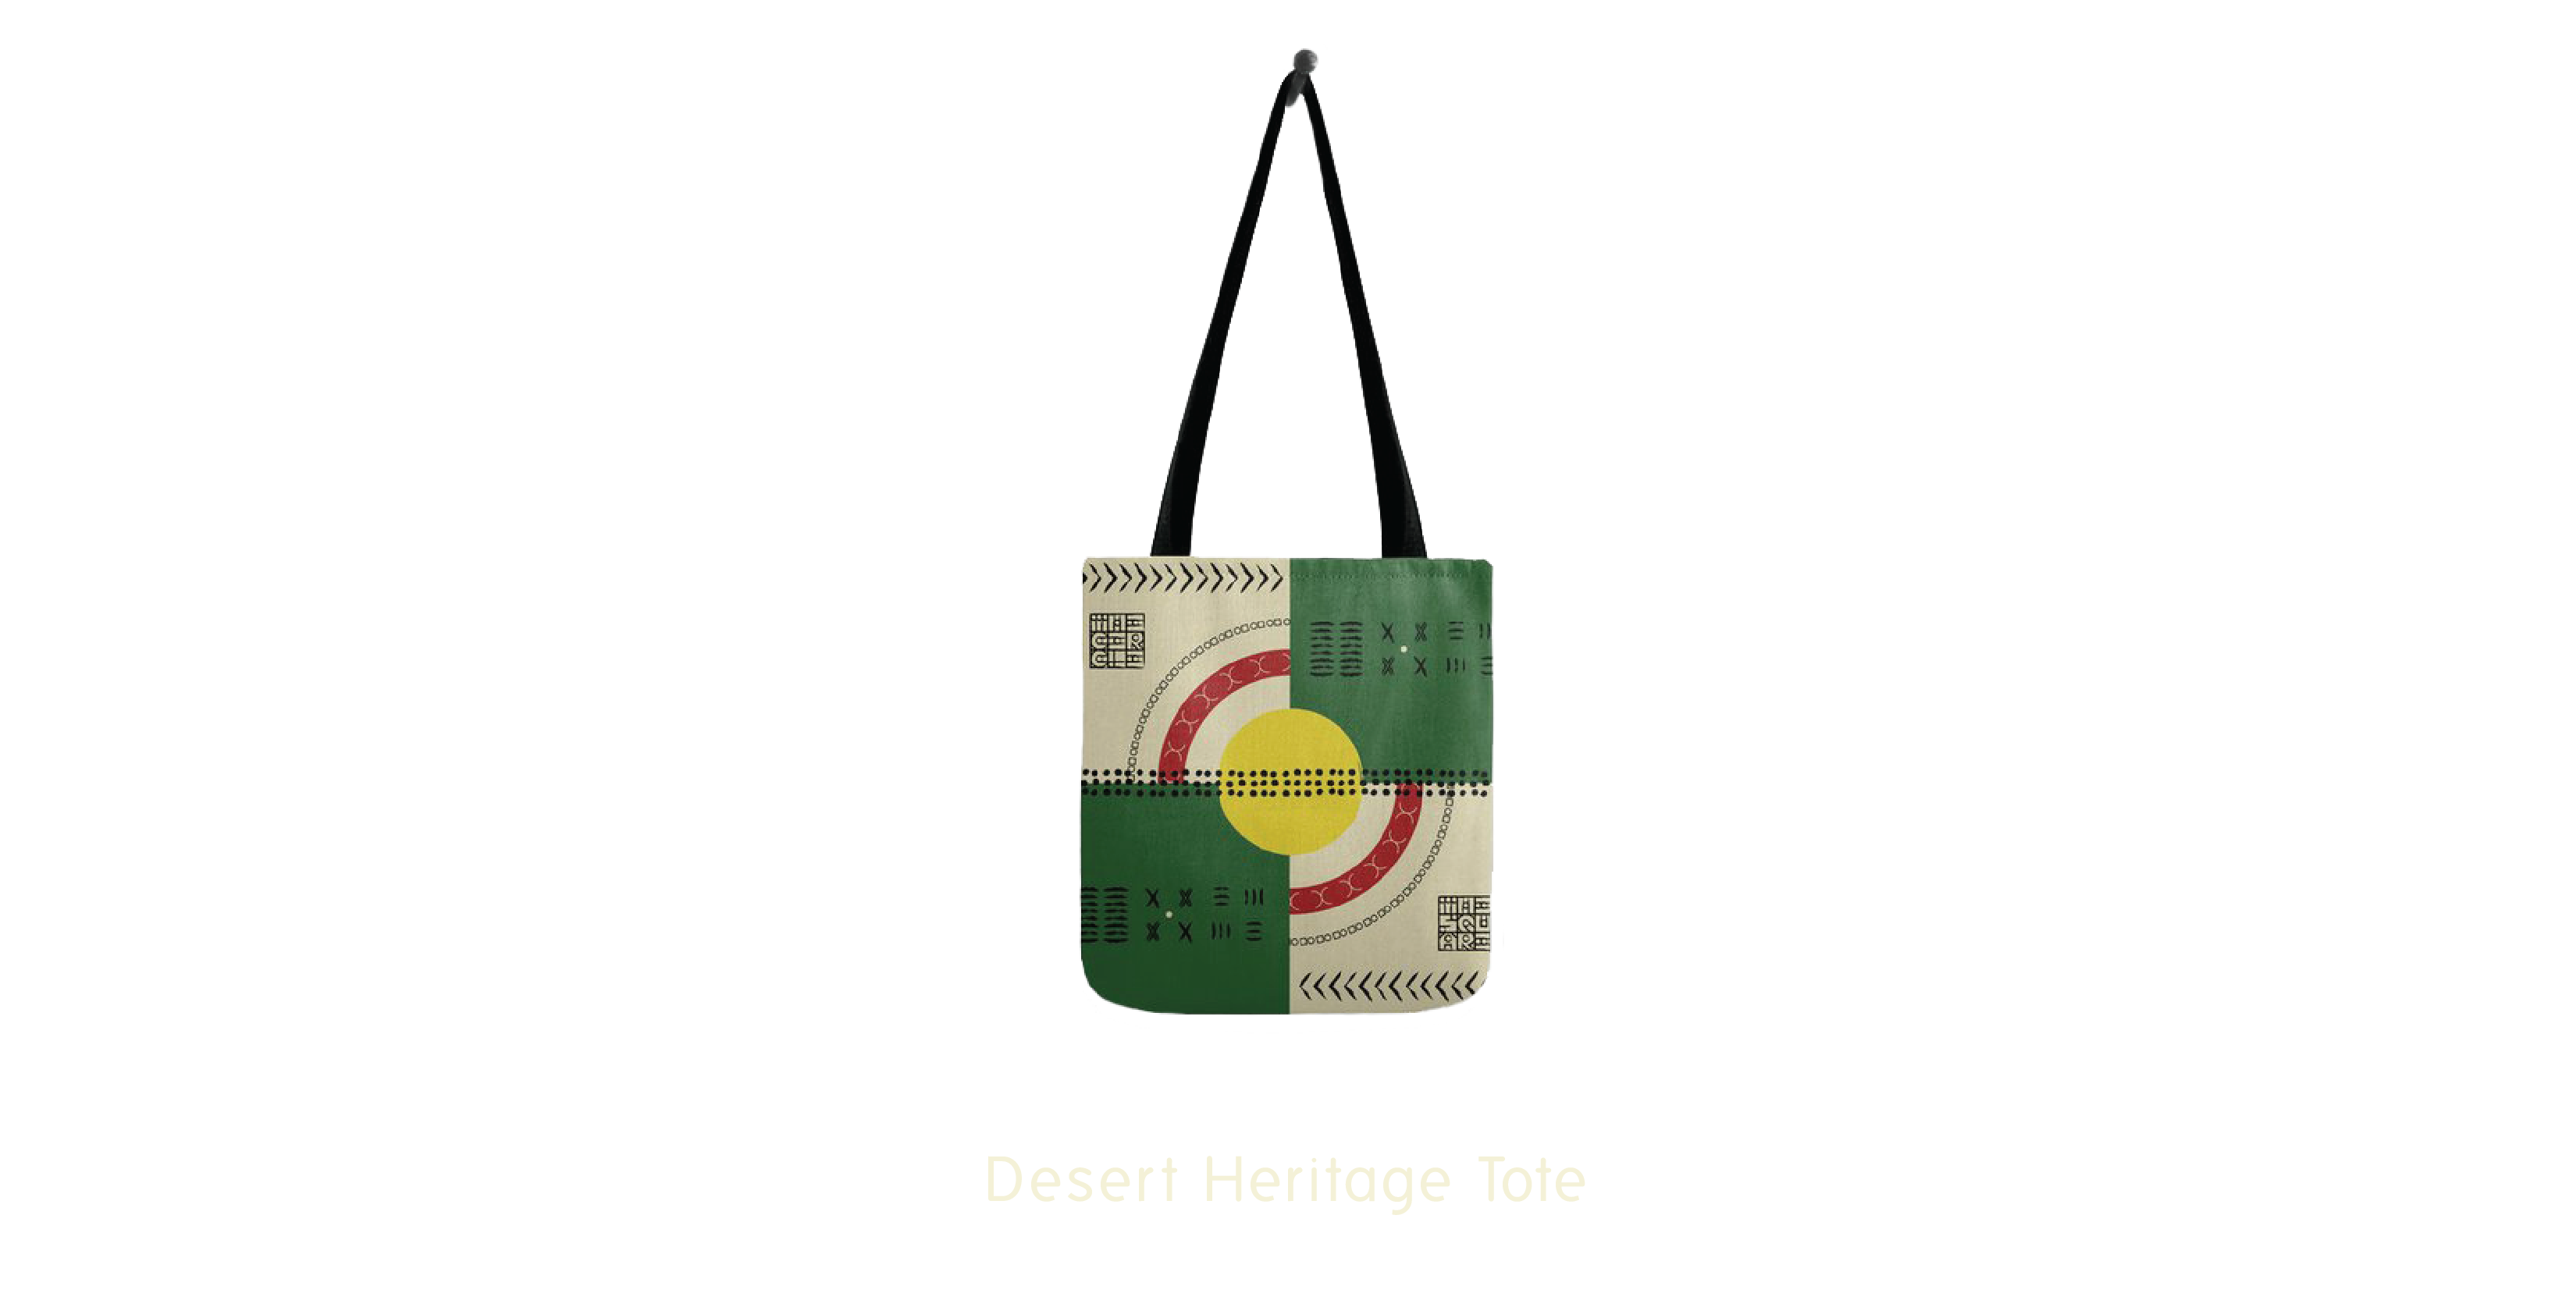 Desert Heritage Tote